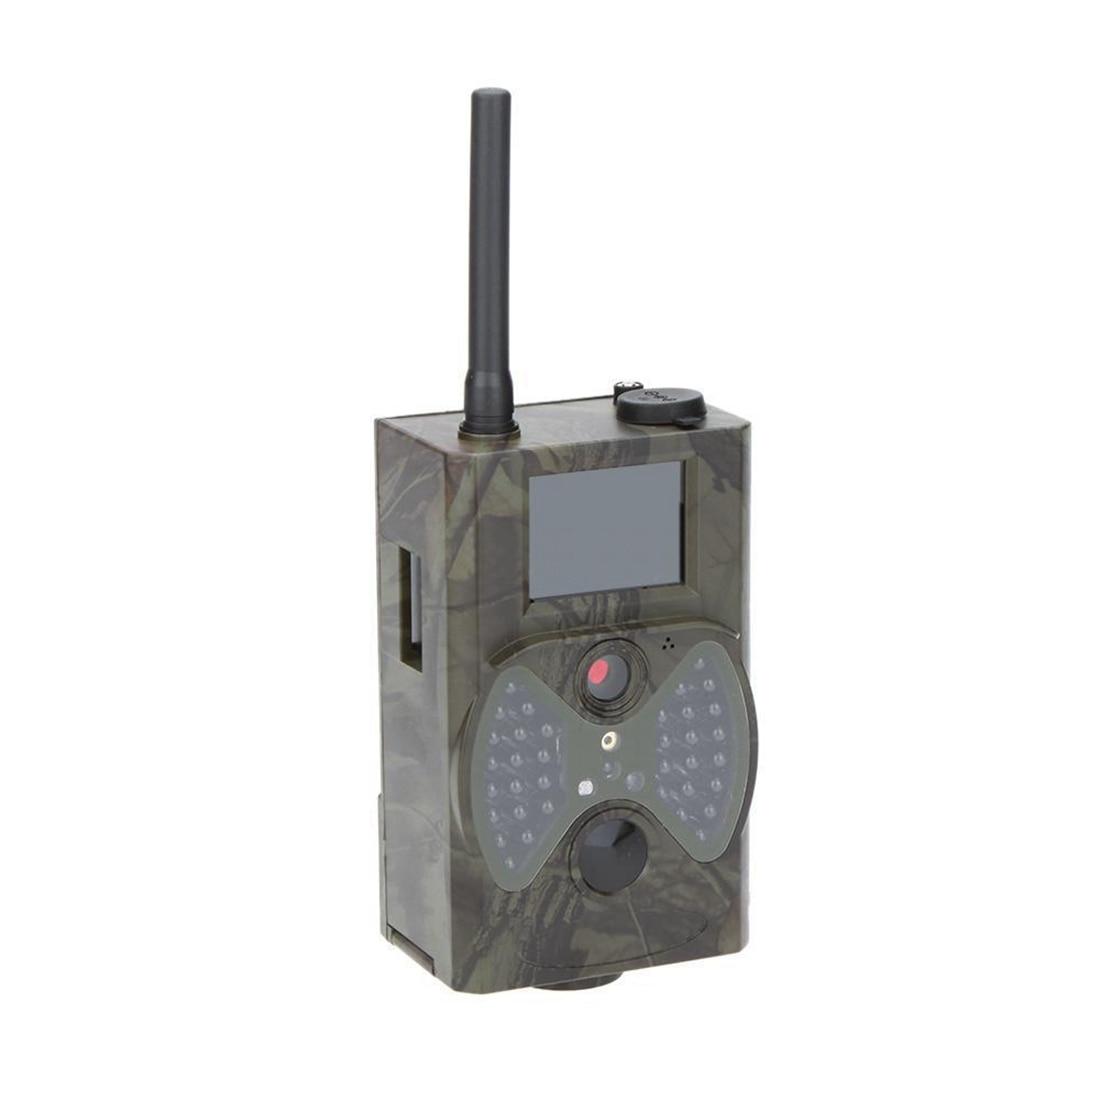 940NM Scouting Hunting Camera HC300M GPRS MMS Infrared Trail GSM IR LED J6F0 940nm scouting hunting camera hc300m new